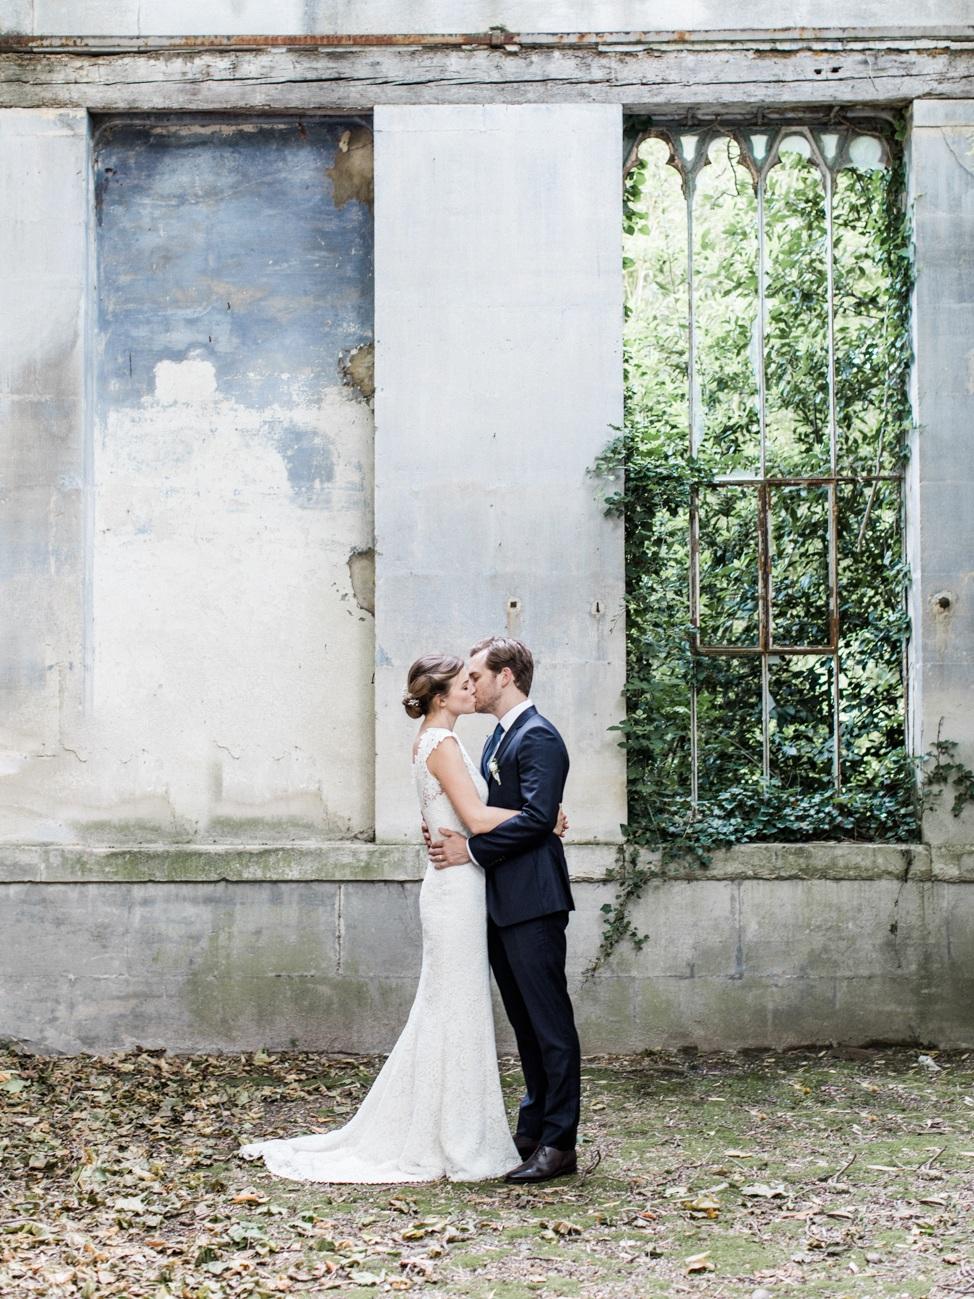 Provence_Wedding_(c)_Rory_Wylie-117.jpg